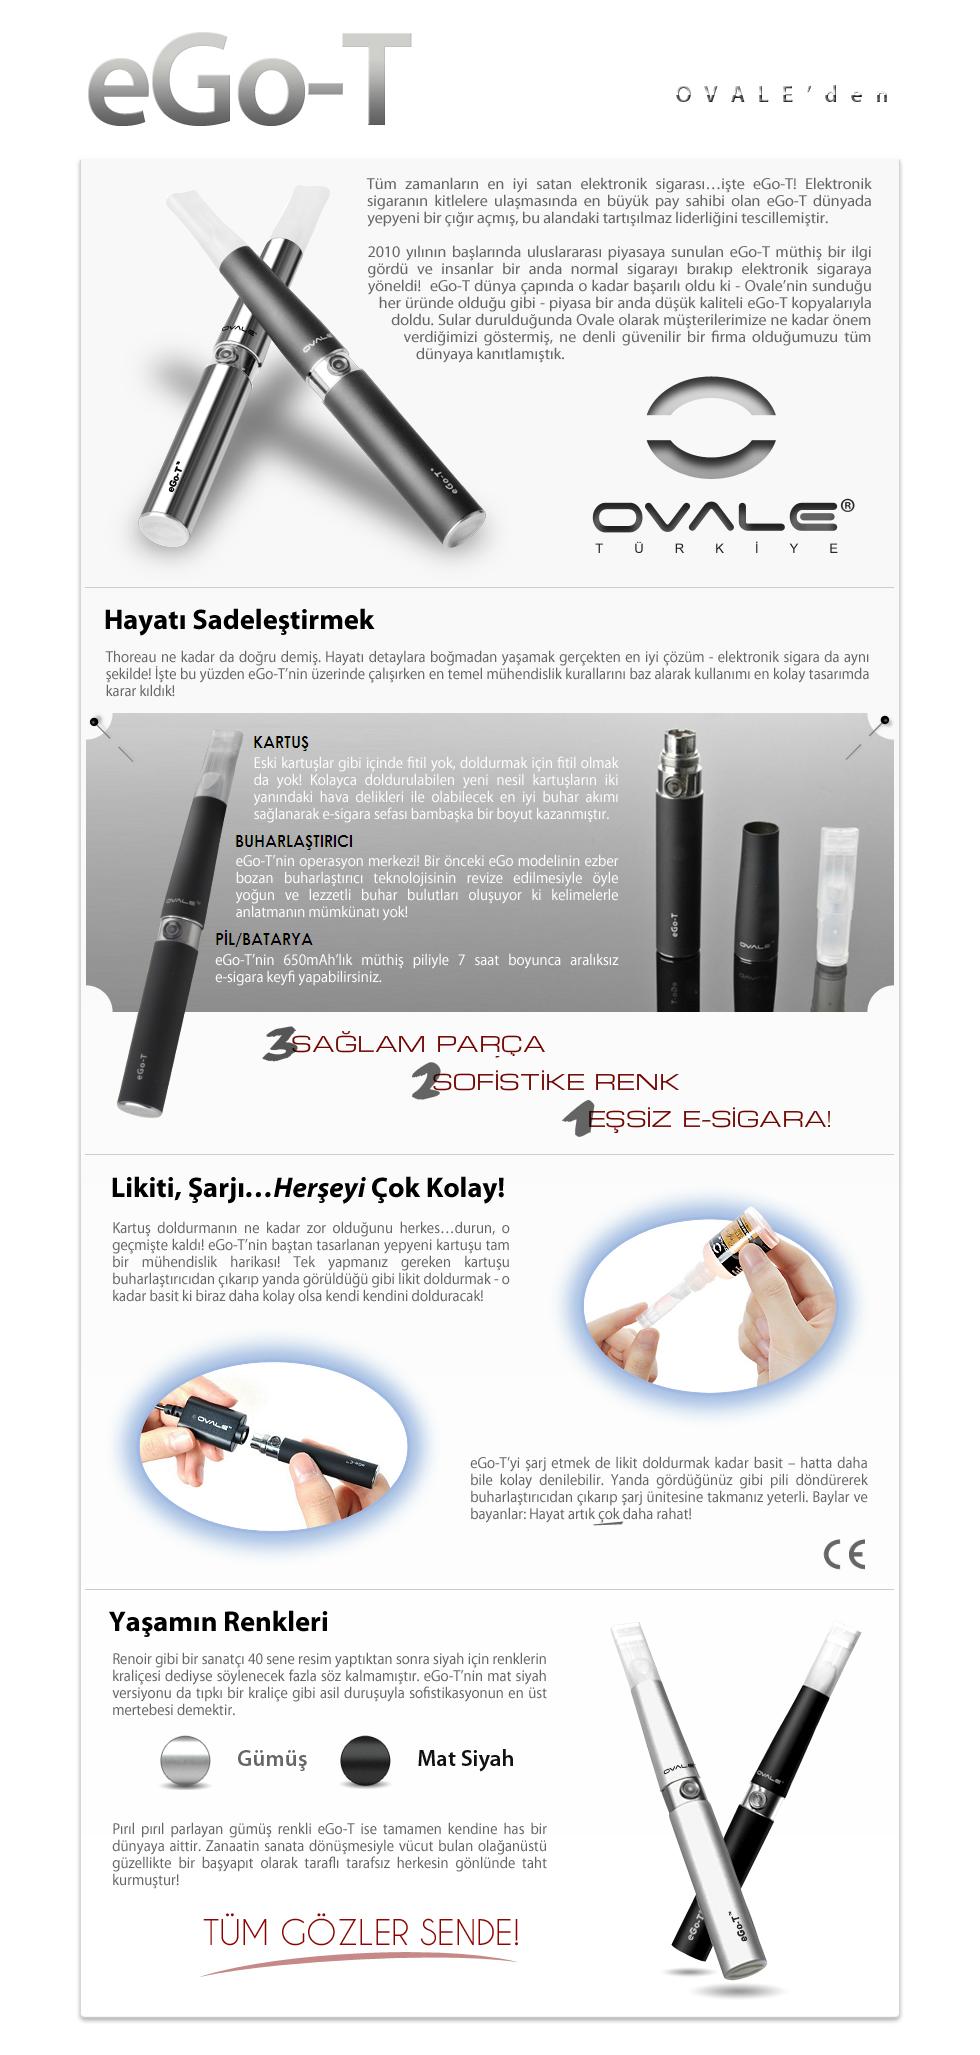 elektronik sigara, esigara, e, sigara, sigarayı bırak, elektronik sigara likit, ovale, joyetech, ego